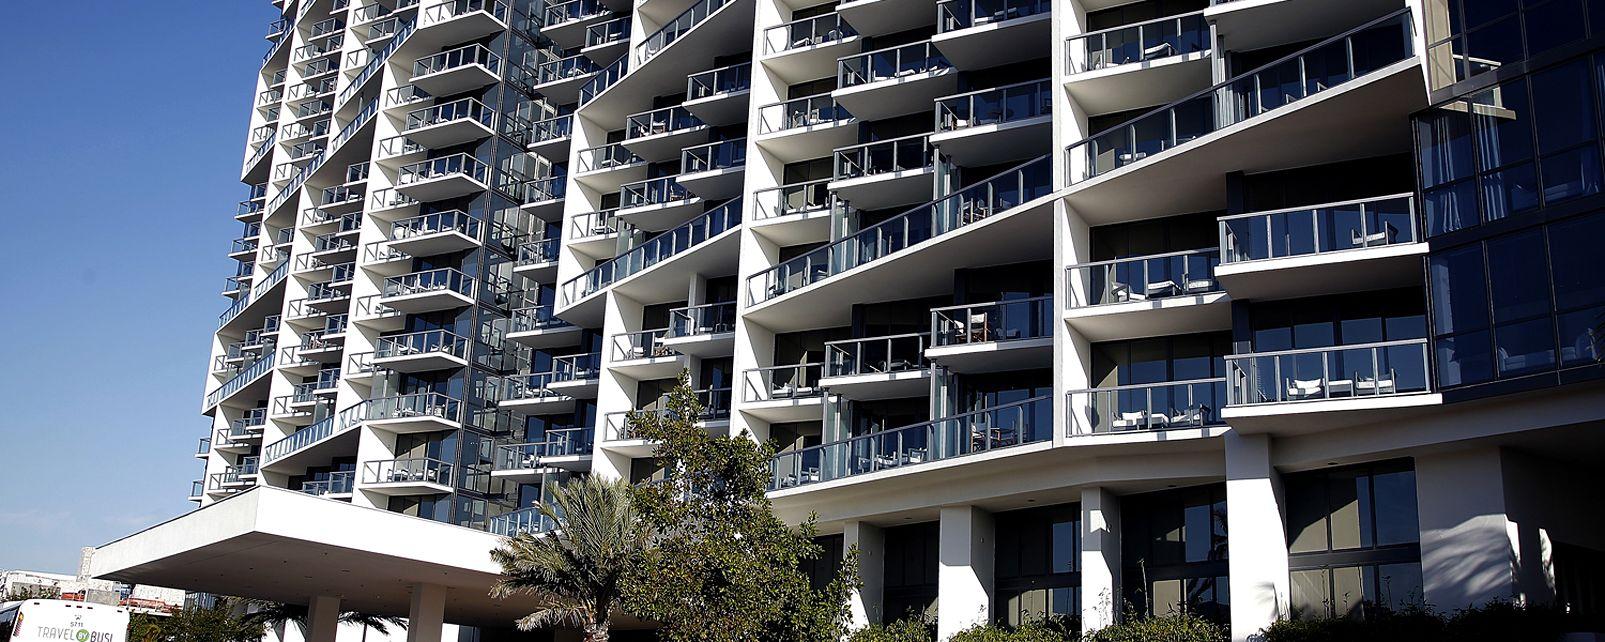 Hotel  The W South Beach